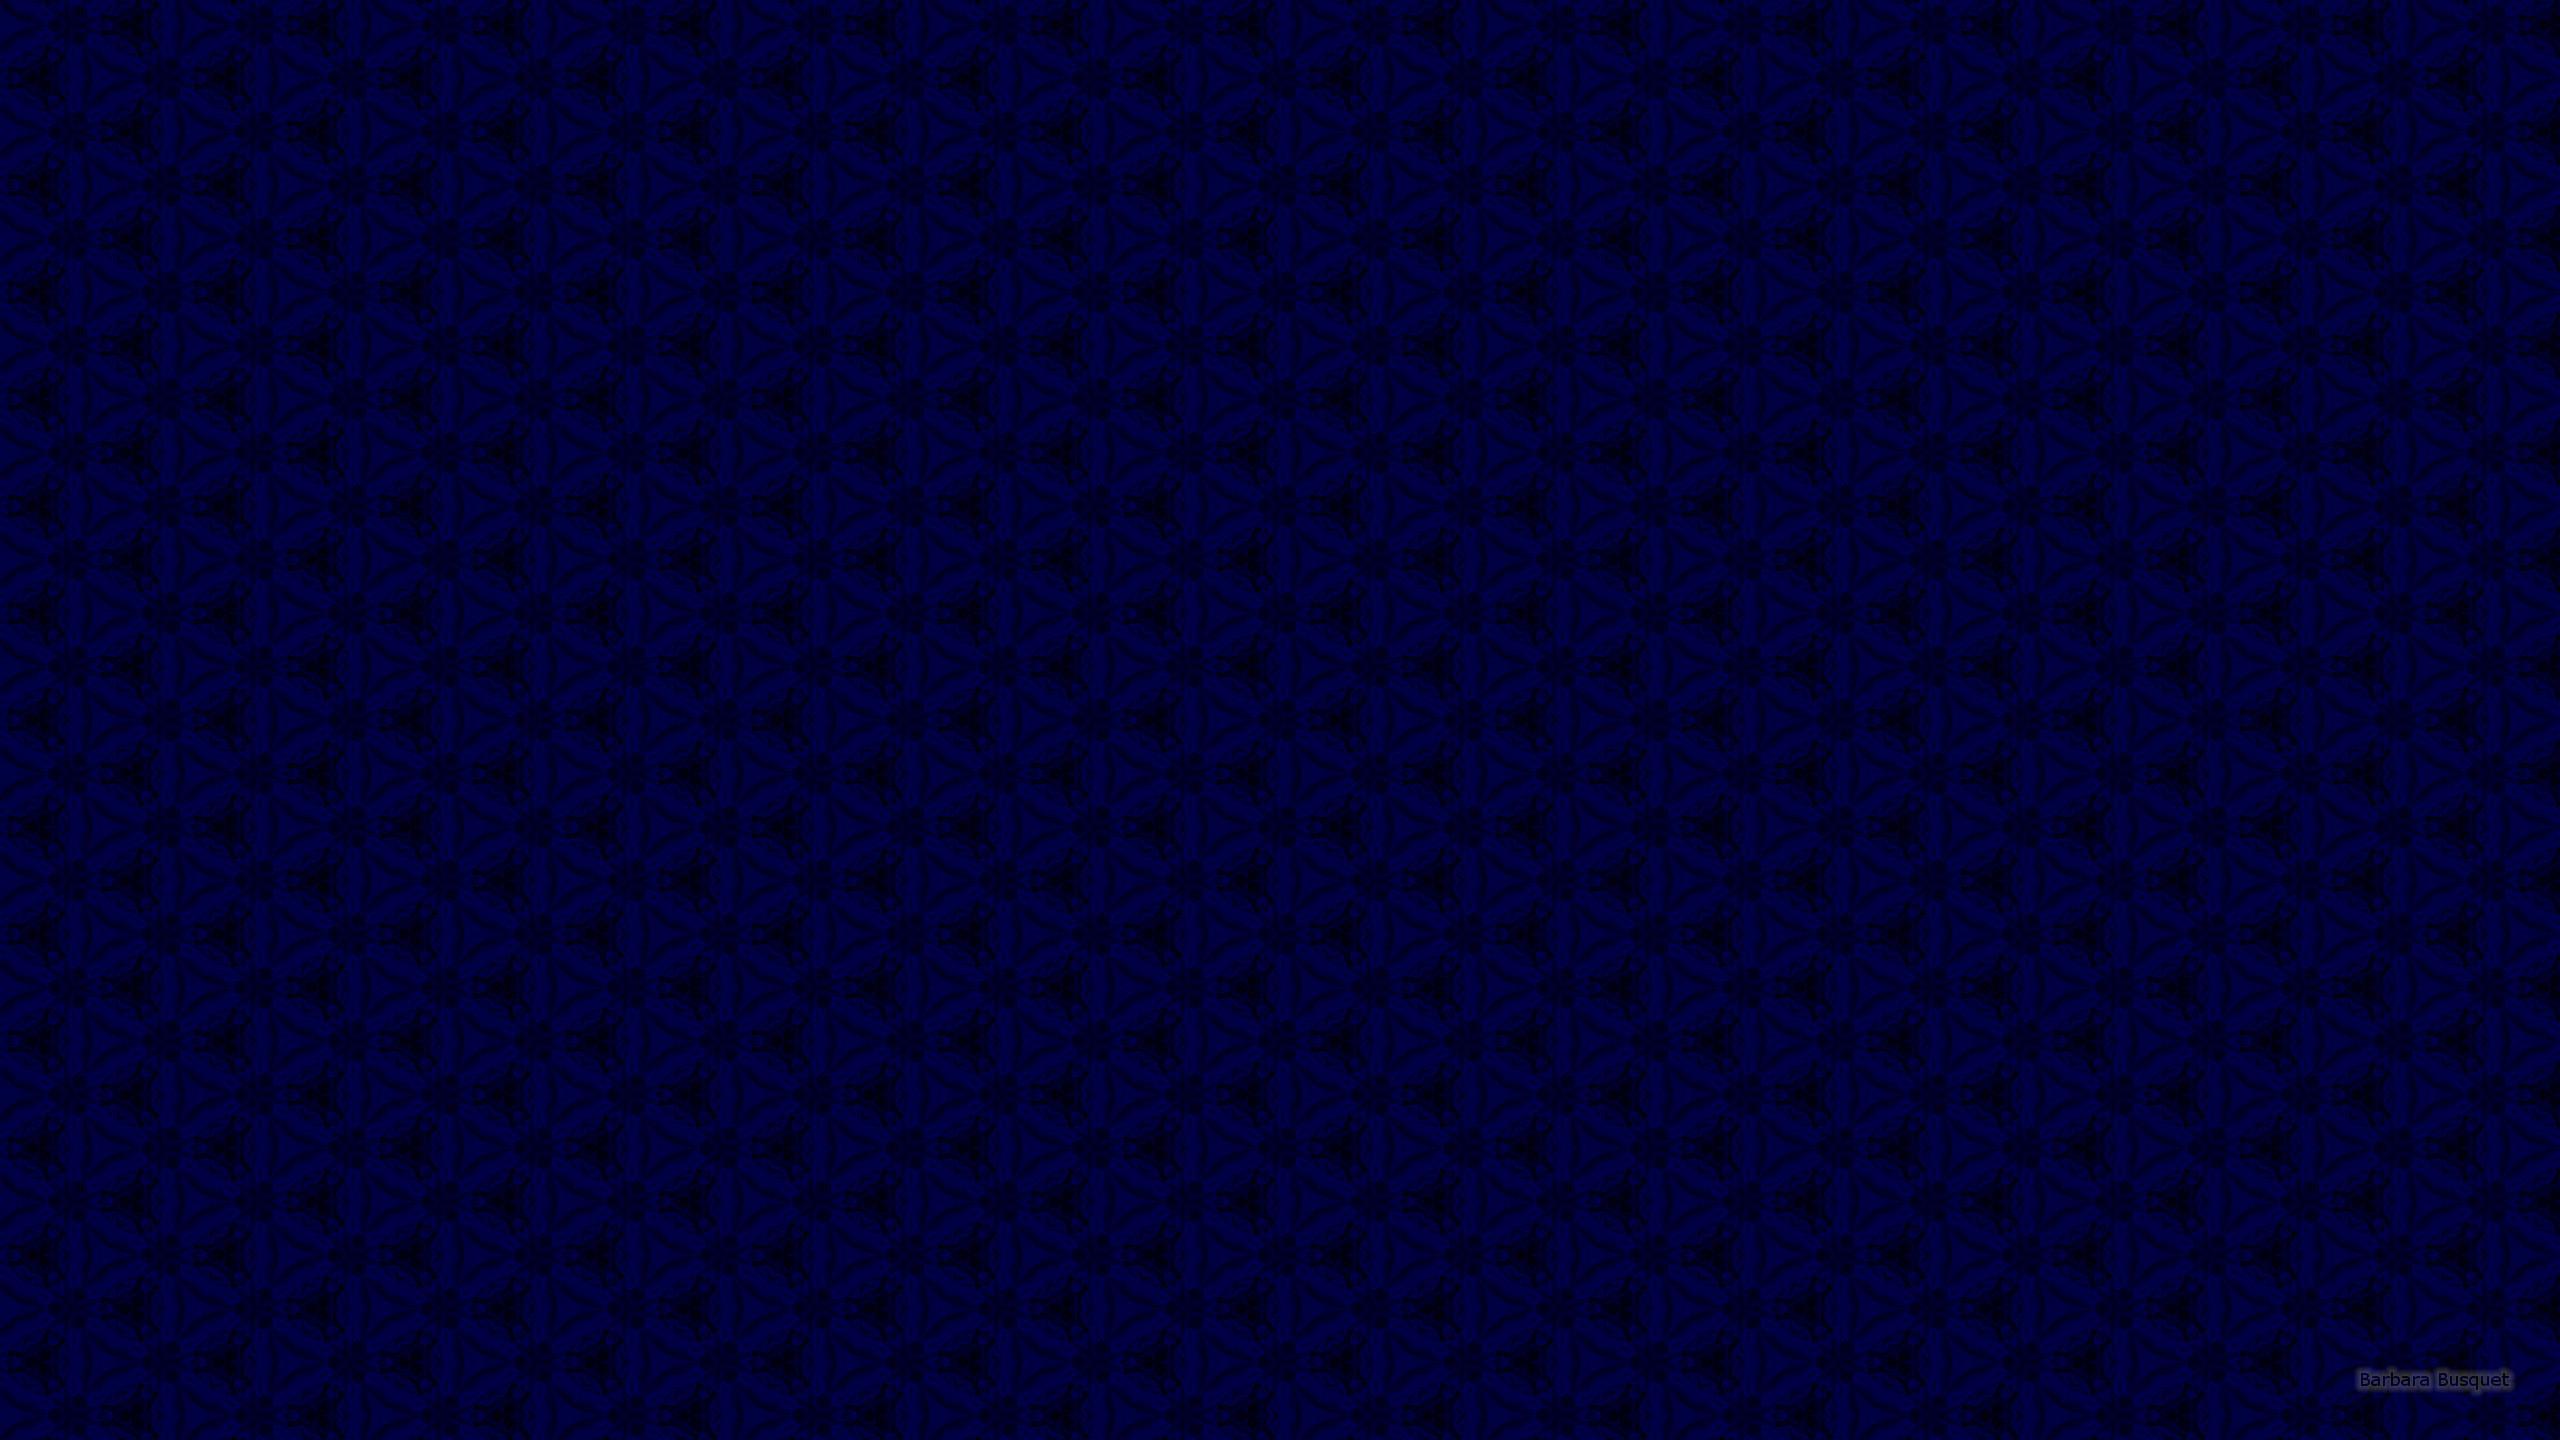 2880x1800 Vintage Navy Blue Wallpaper Background Px 32903 KB AbstractWhite Victorian Damask